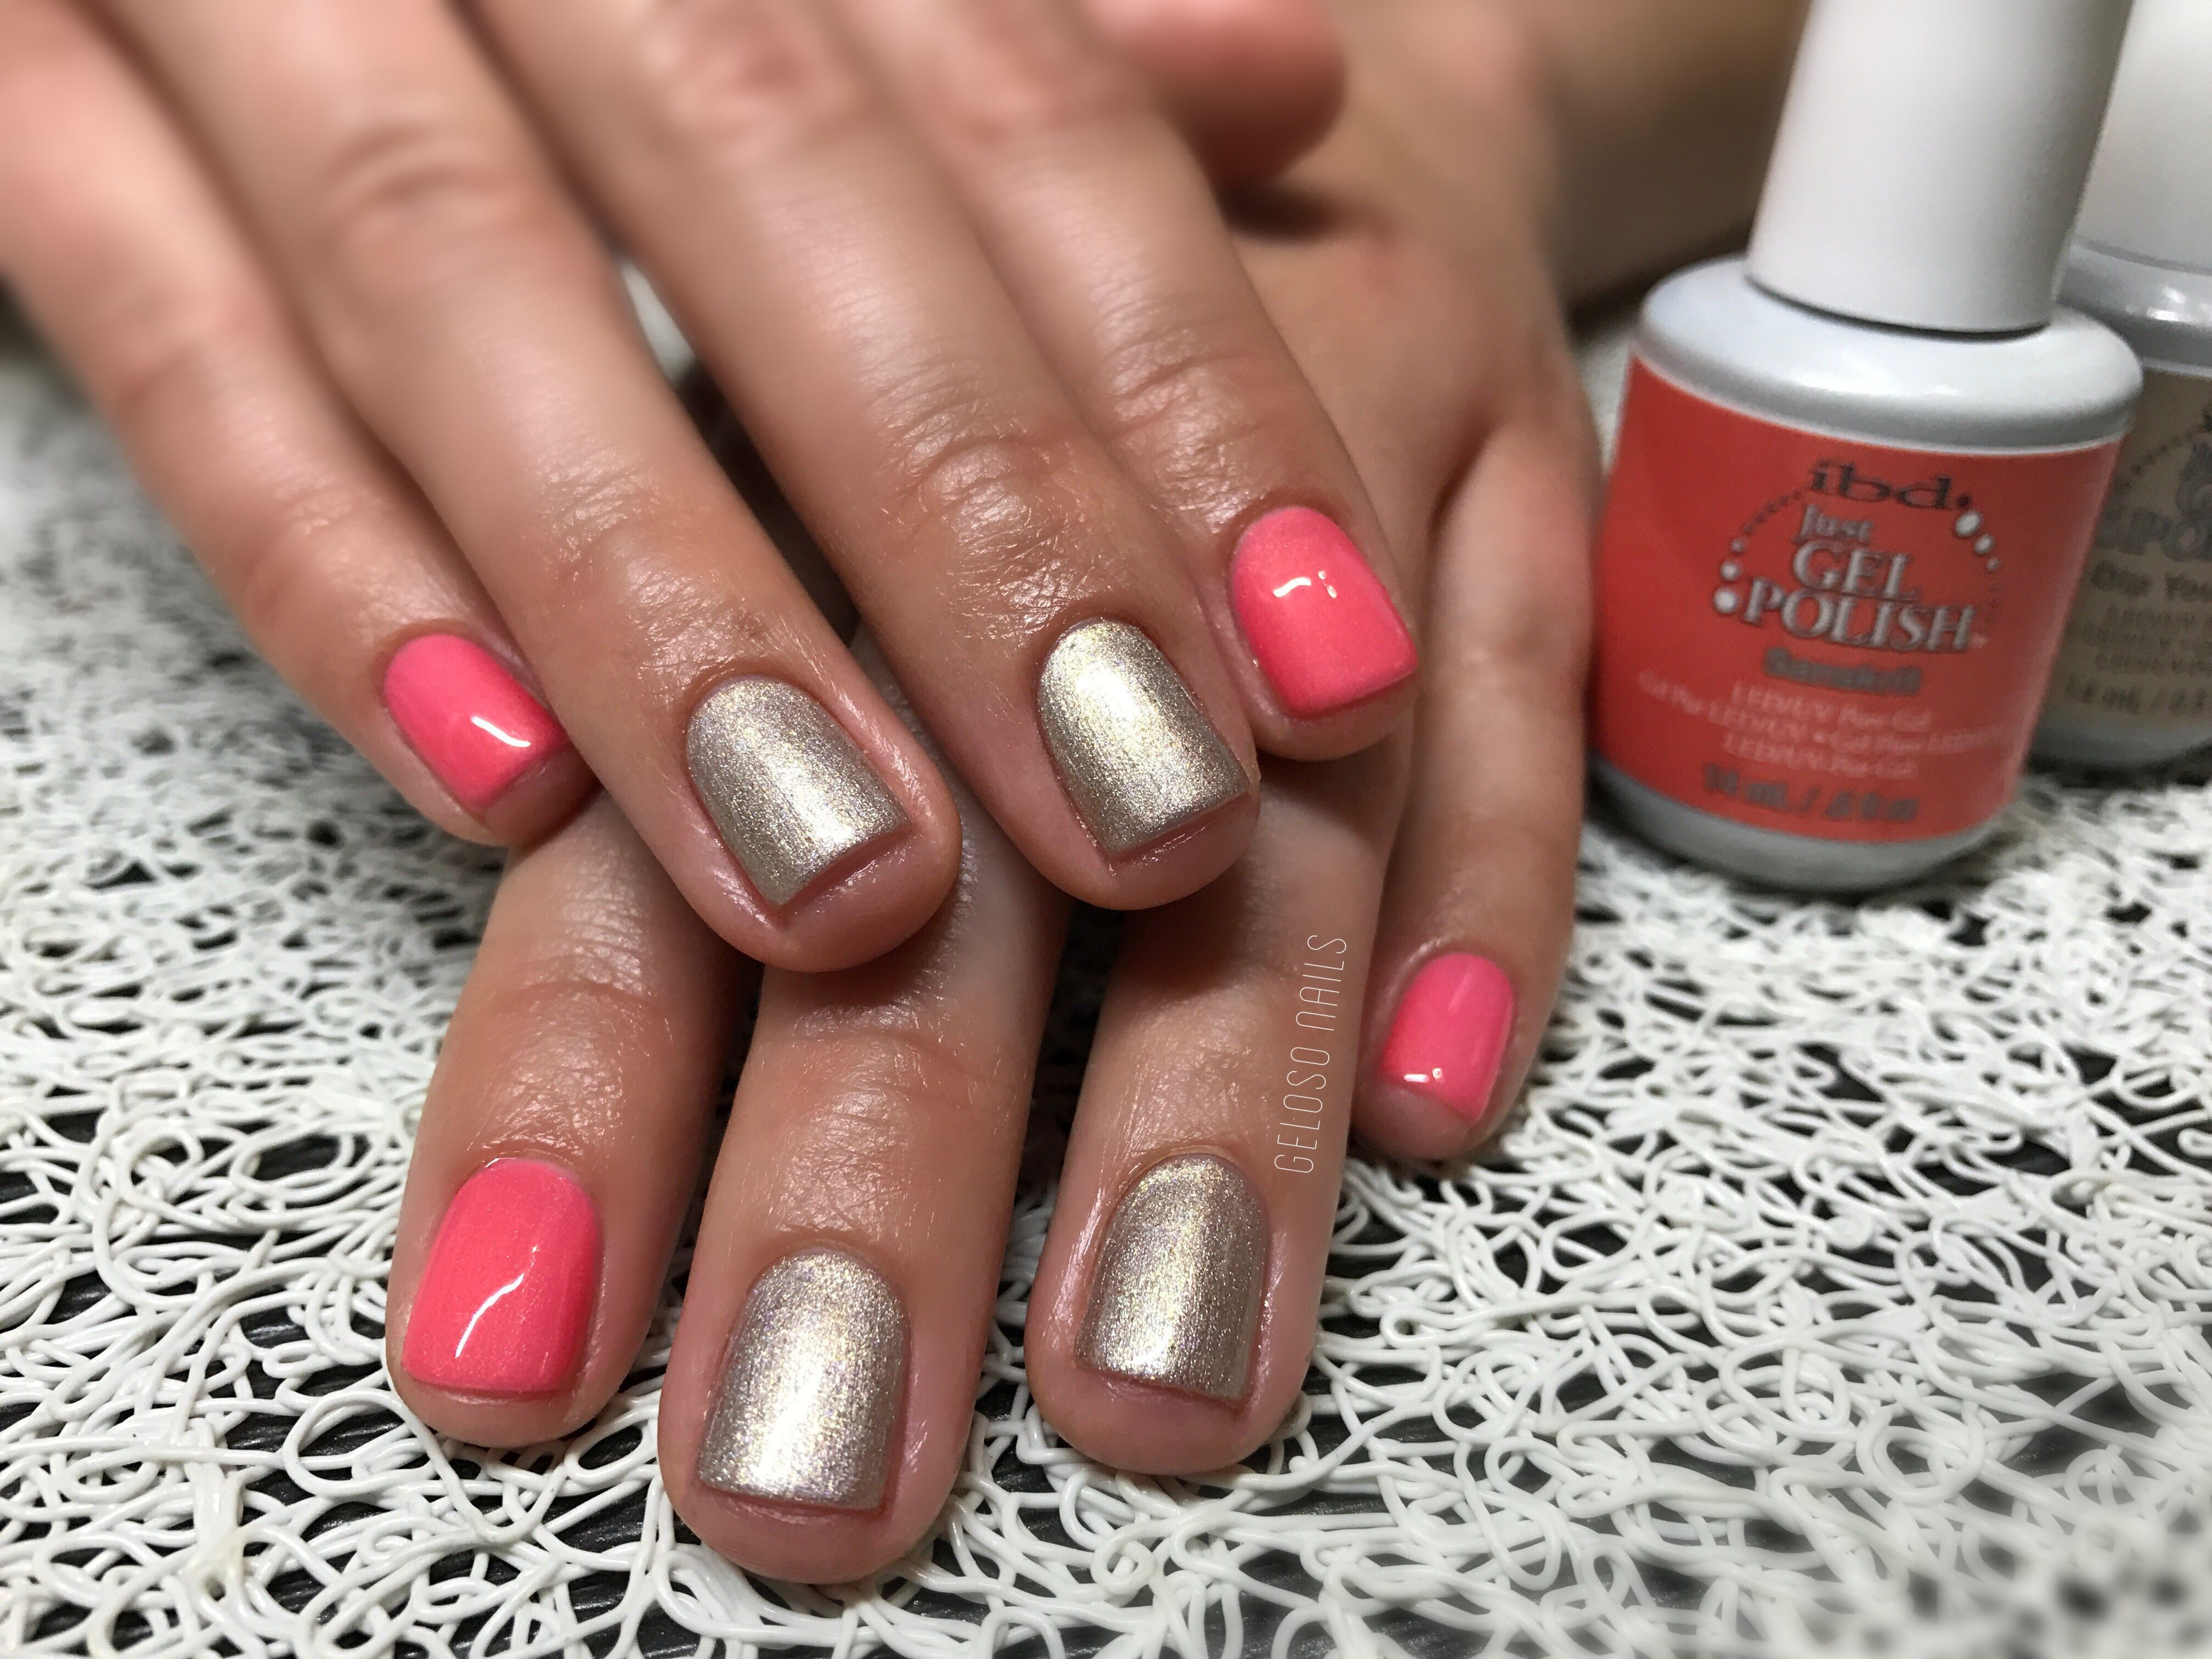 Ibd just gel polish Sanskrit & dip your toes | Geloso Nails ...